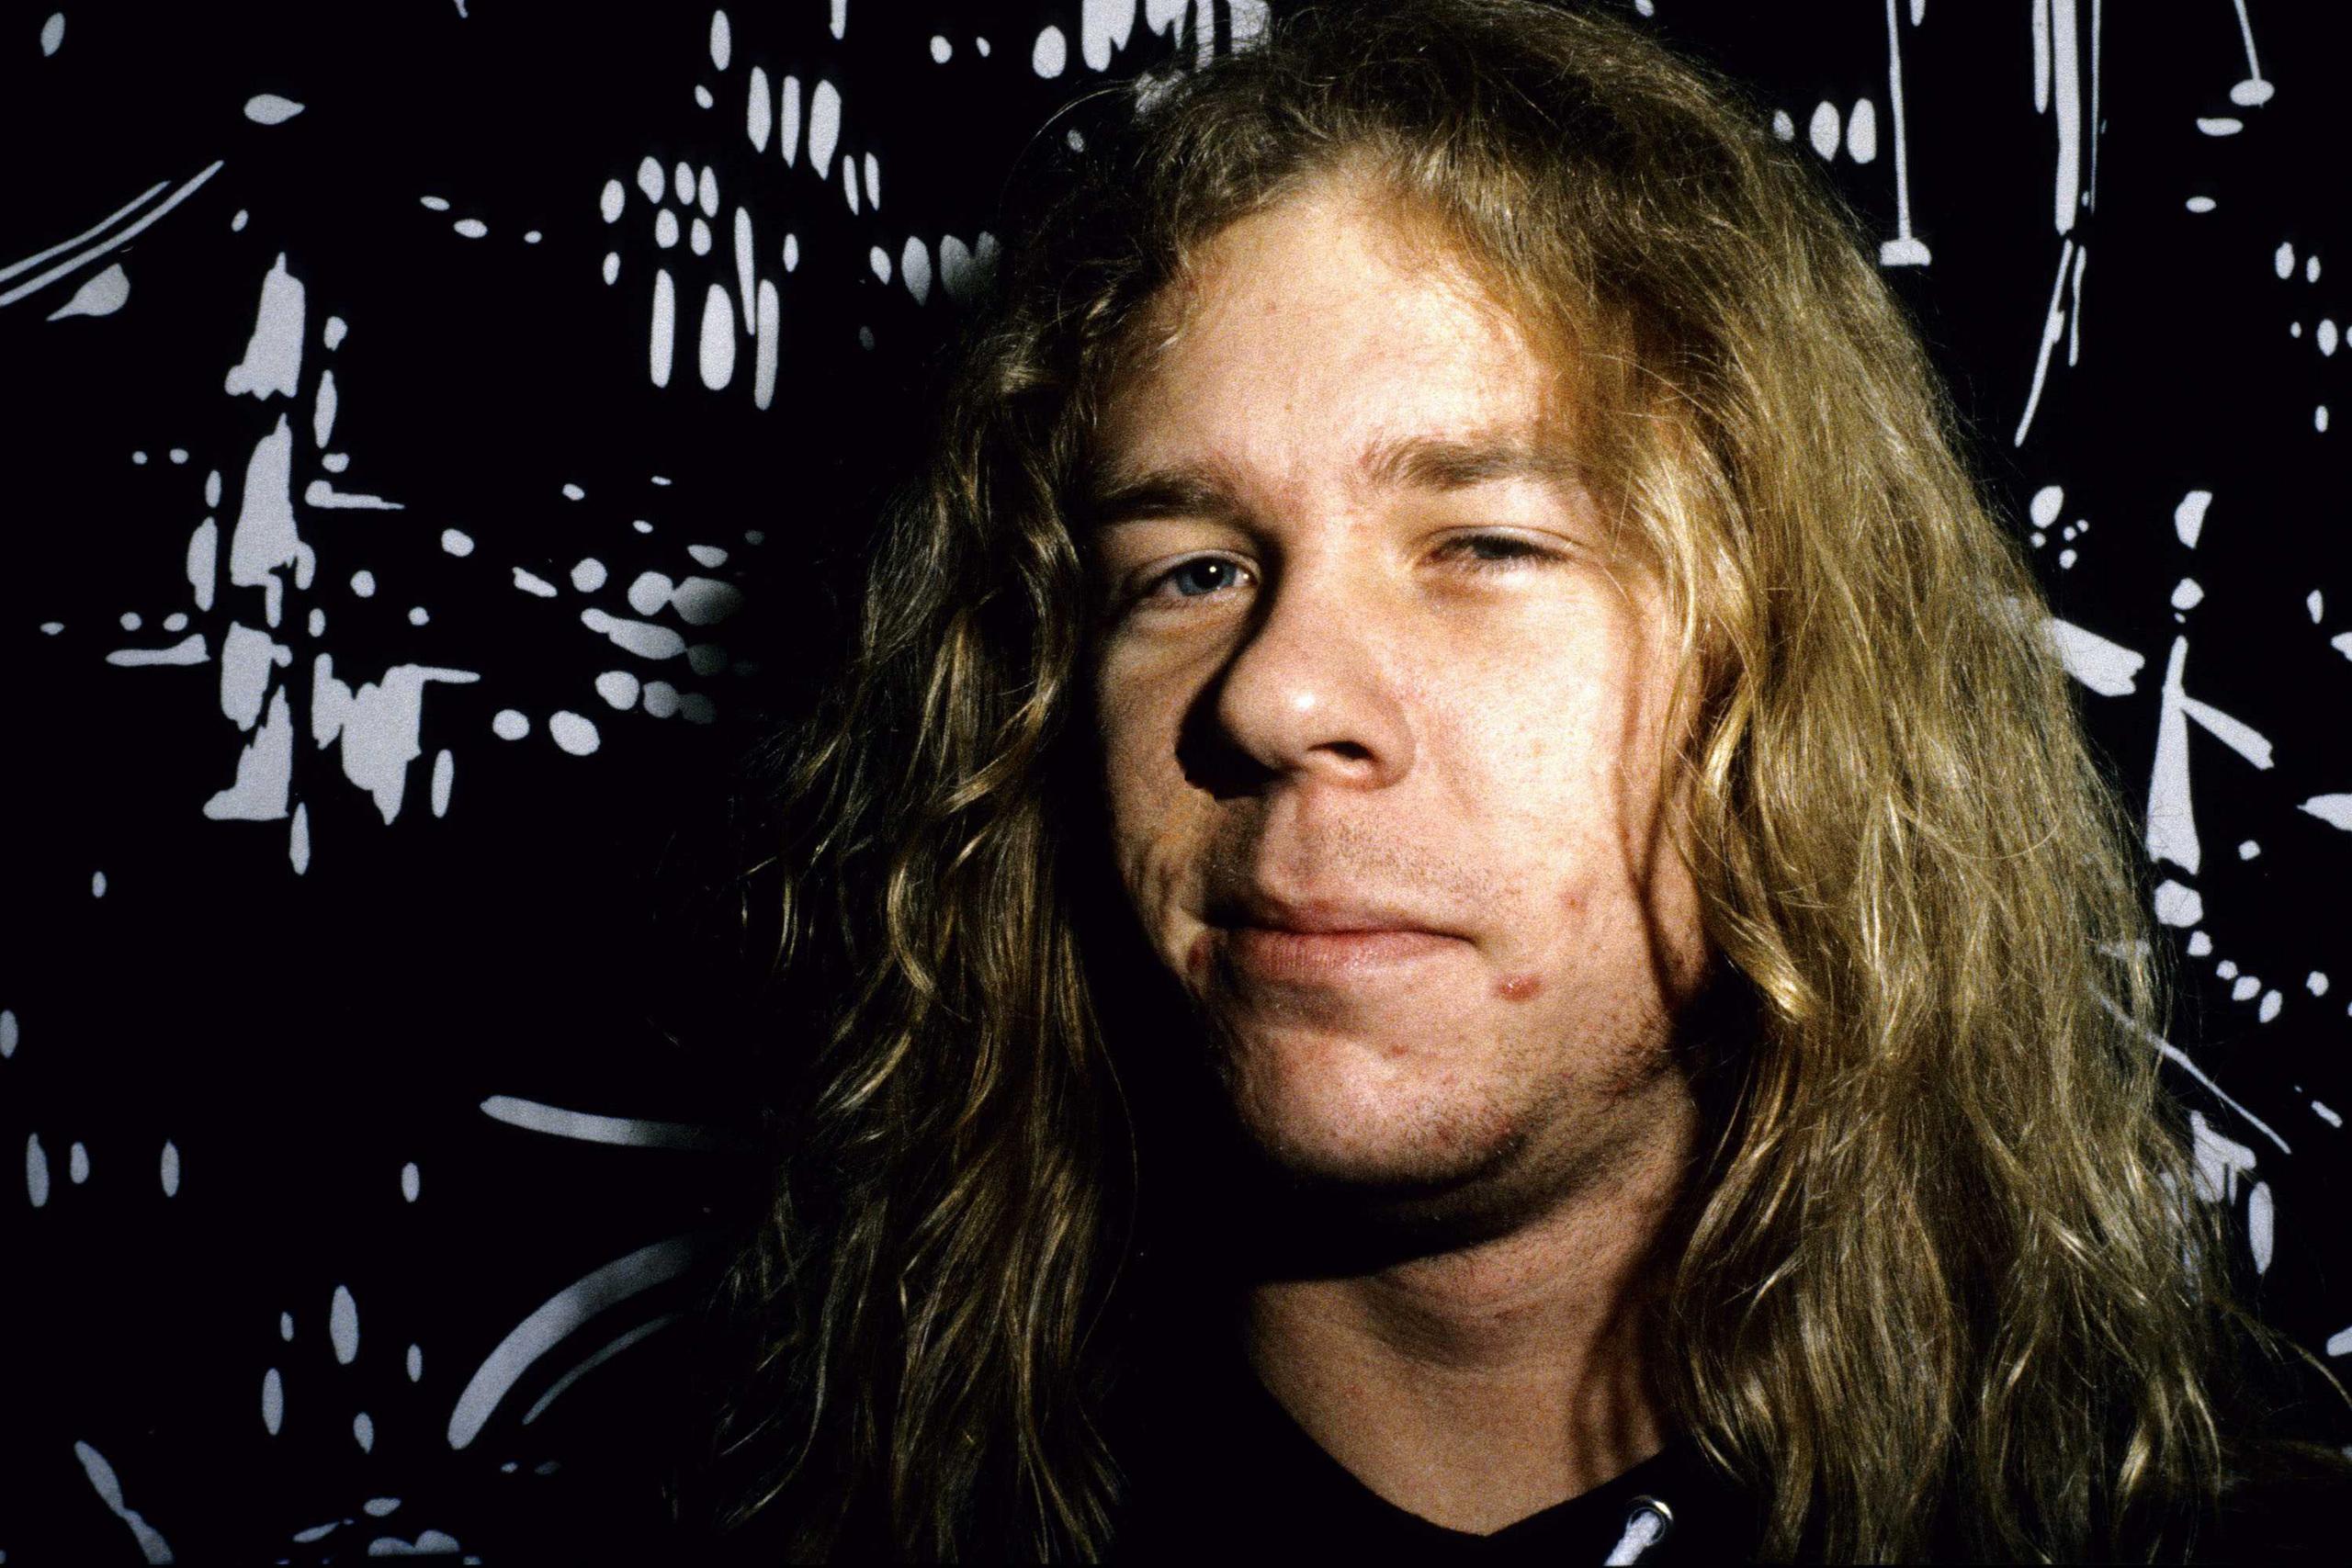 Metallica - Metallica Photo (22253214) - Fanpop